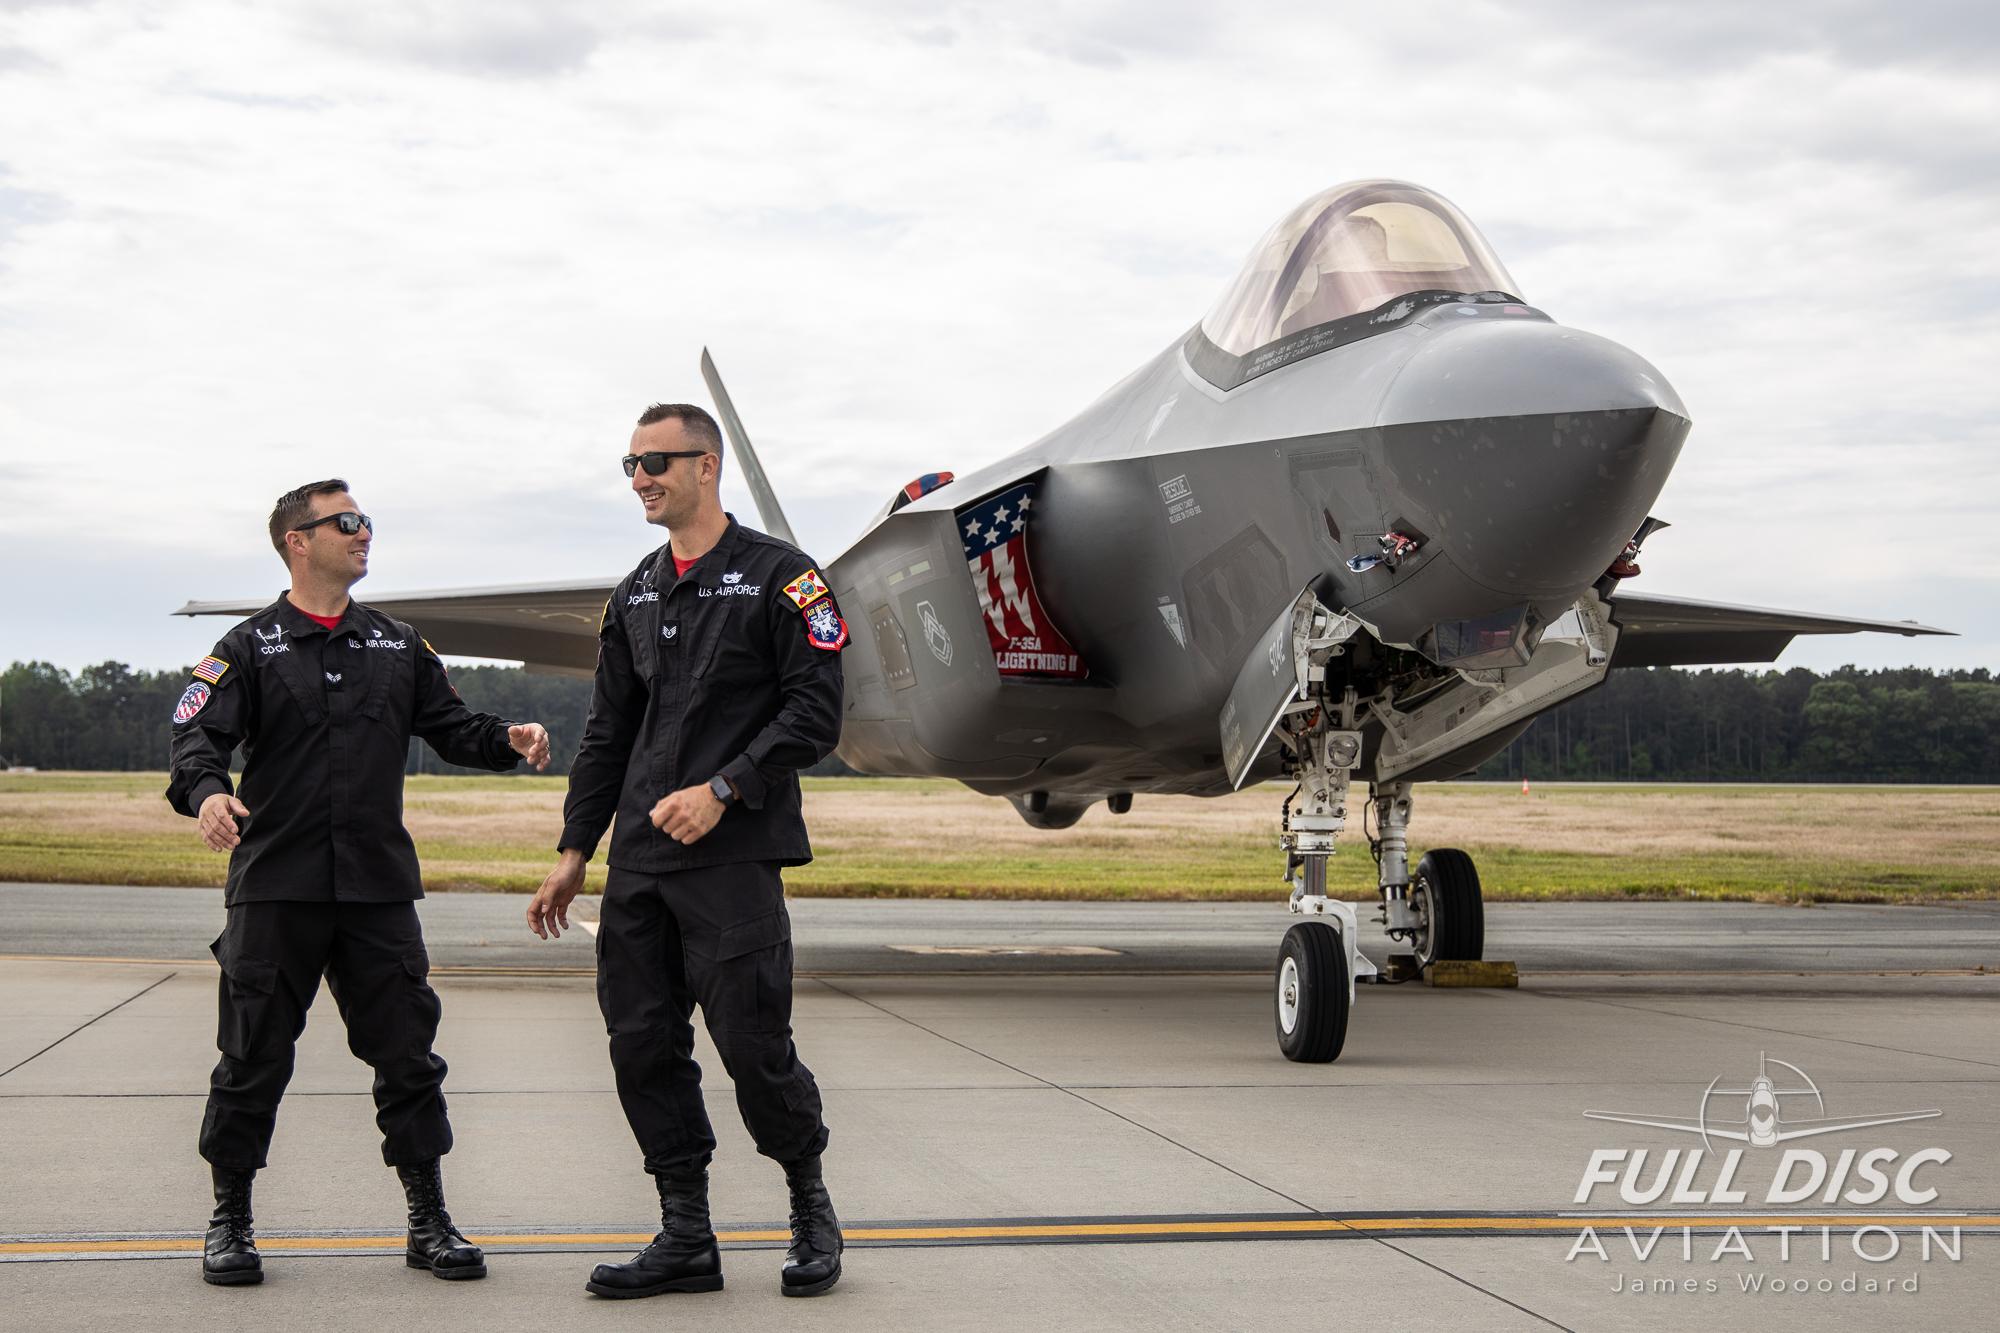 F35DemoTeam_FullDiscAviation_JamesWoodard-April 28, 2019-29.jpg